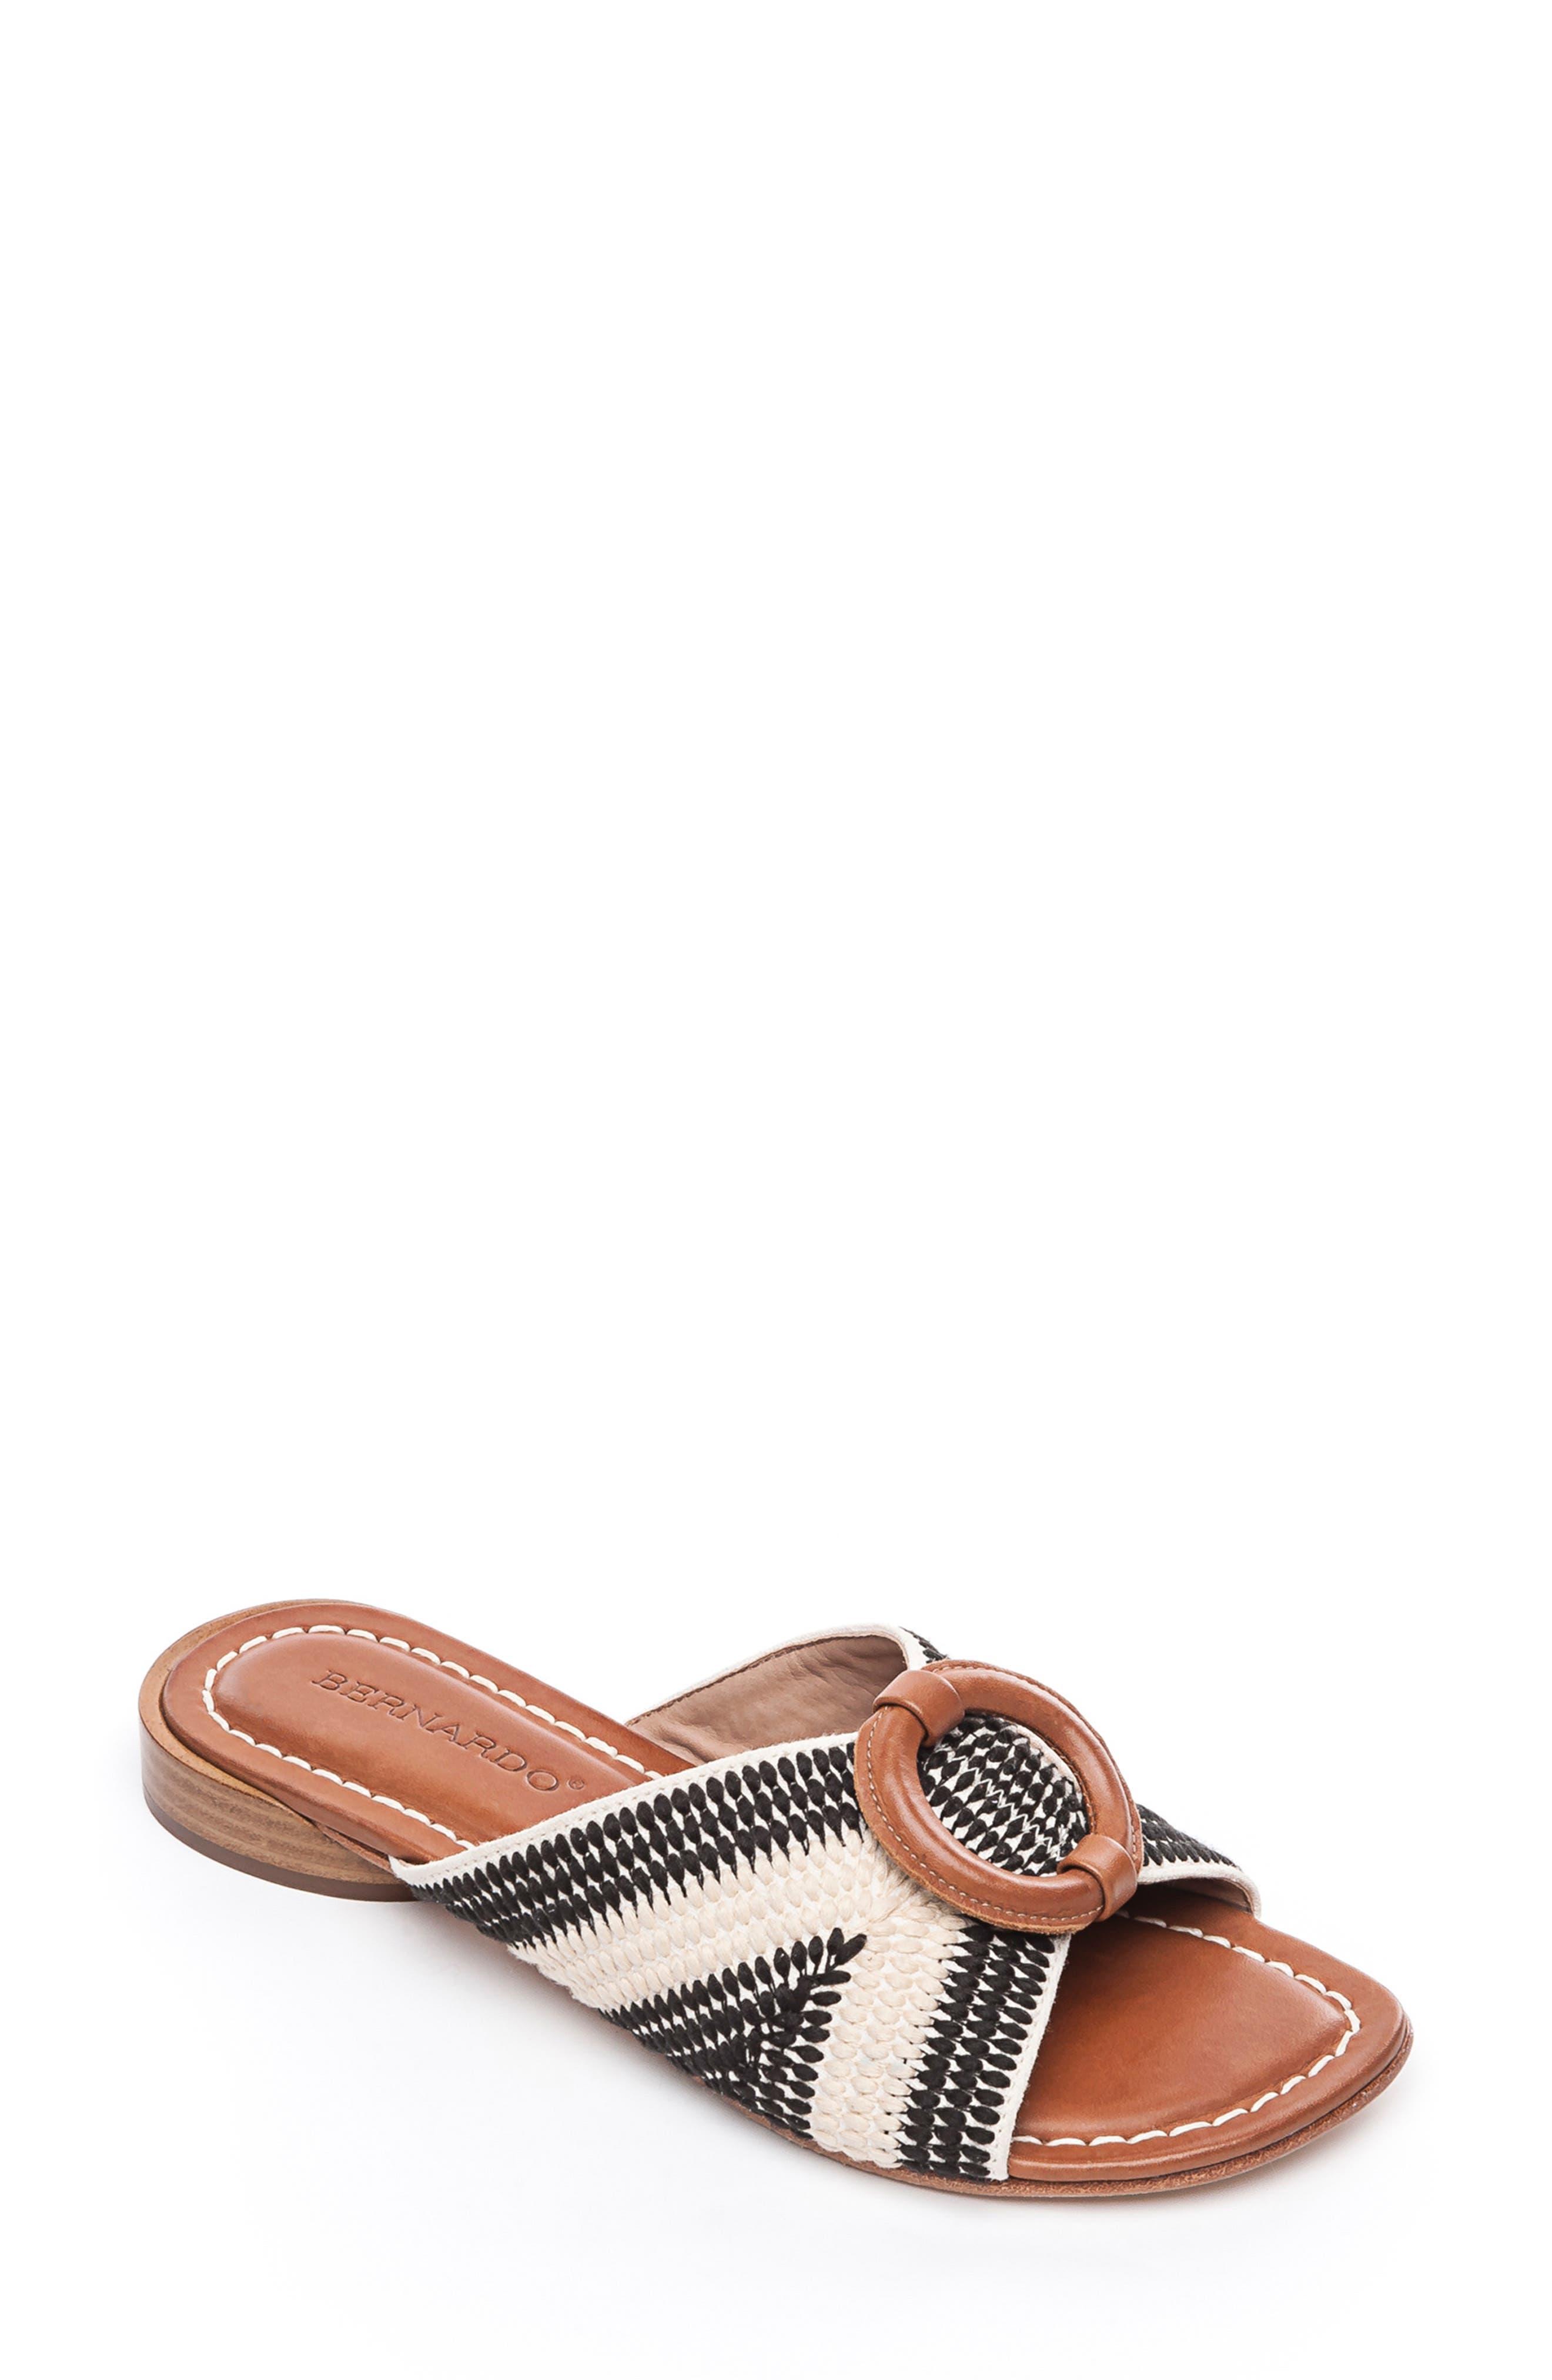 a2d4a17cc8e Bernardo Footwear Tay Slide Sandal- Ivory